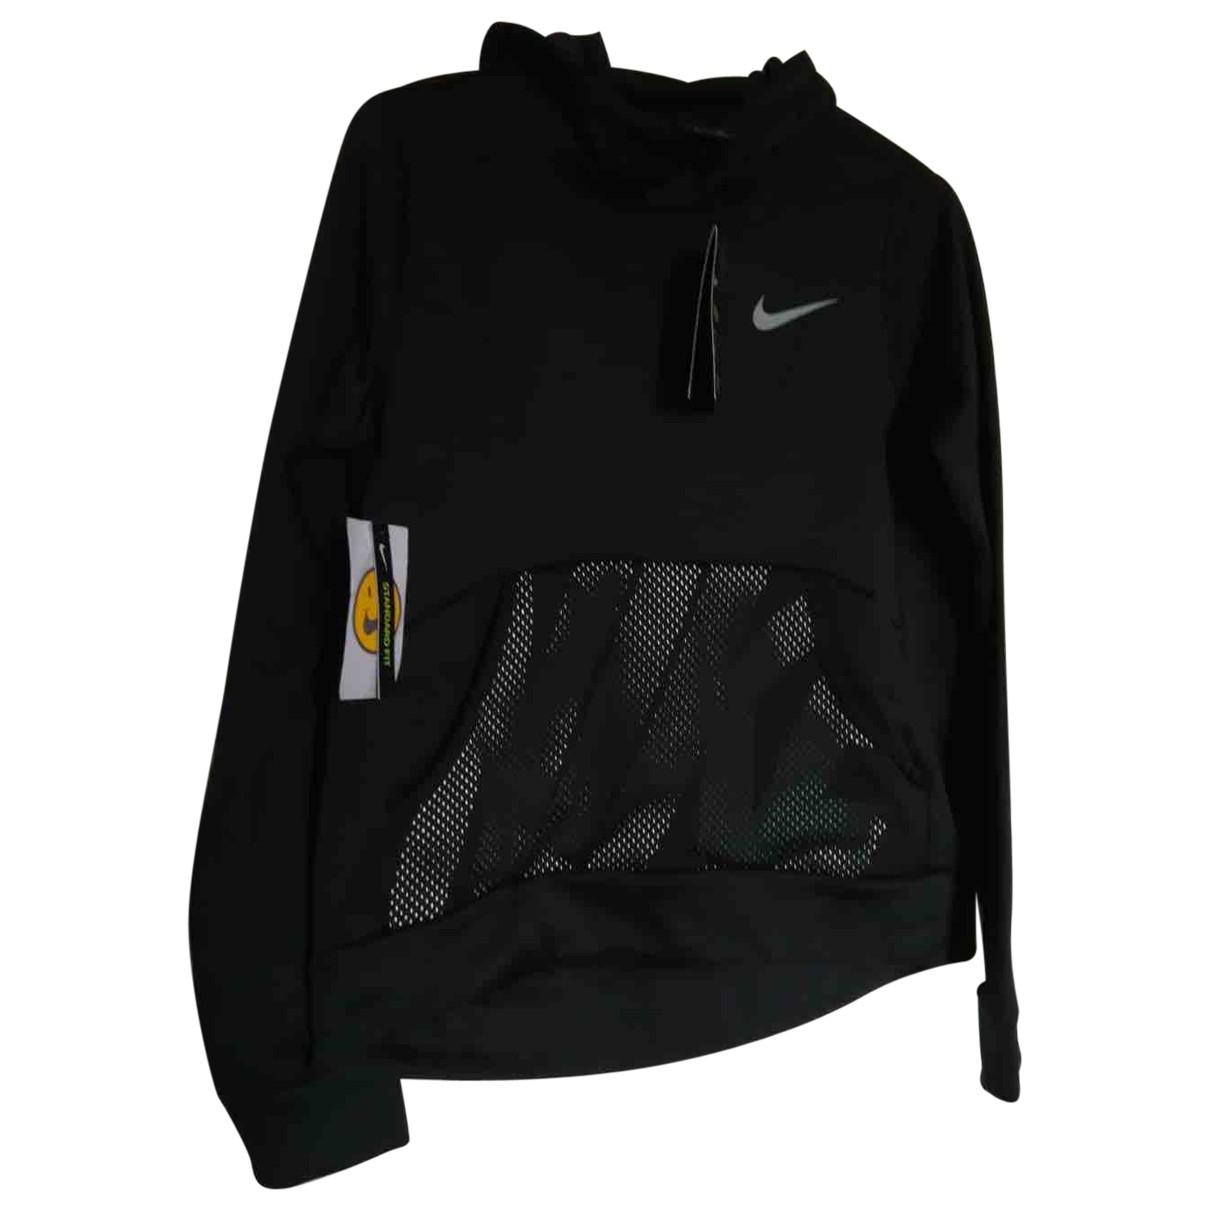 Nike \N Black Knitwear for Kids 20 years - XL UK